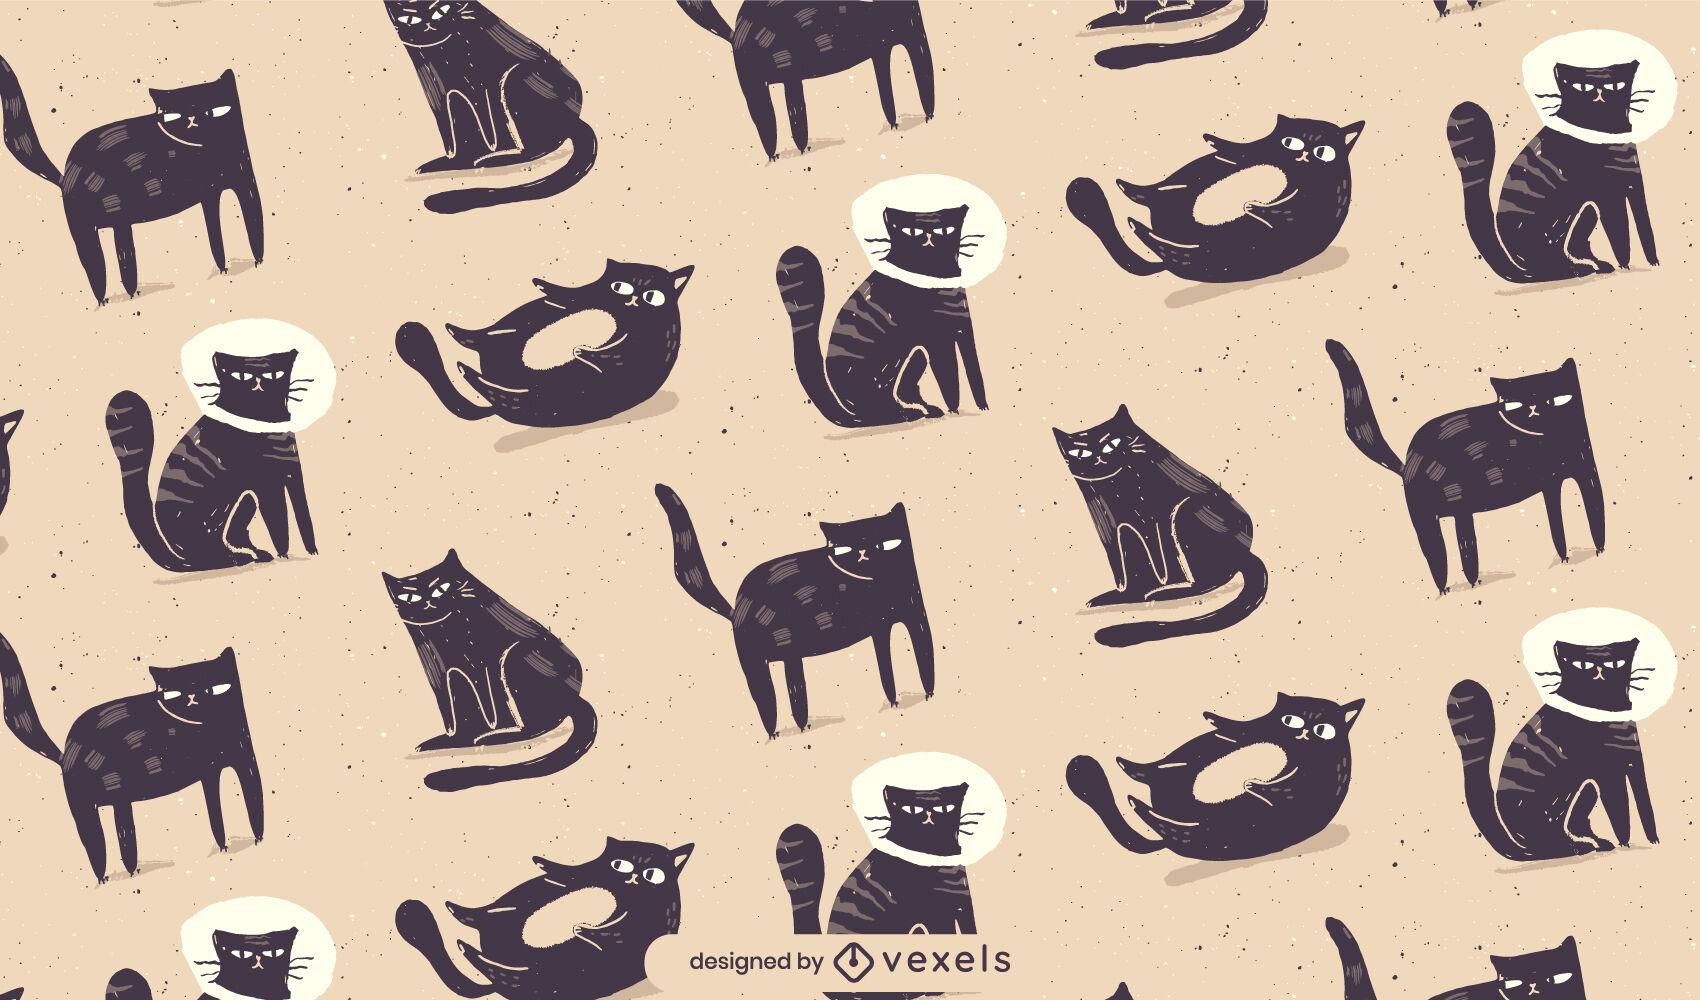 Black cats illustration pattern